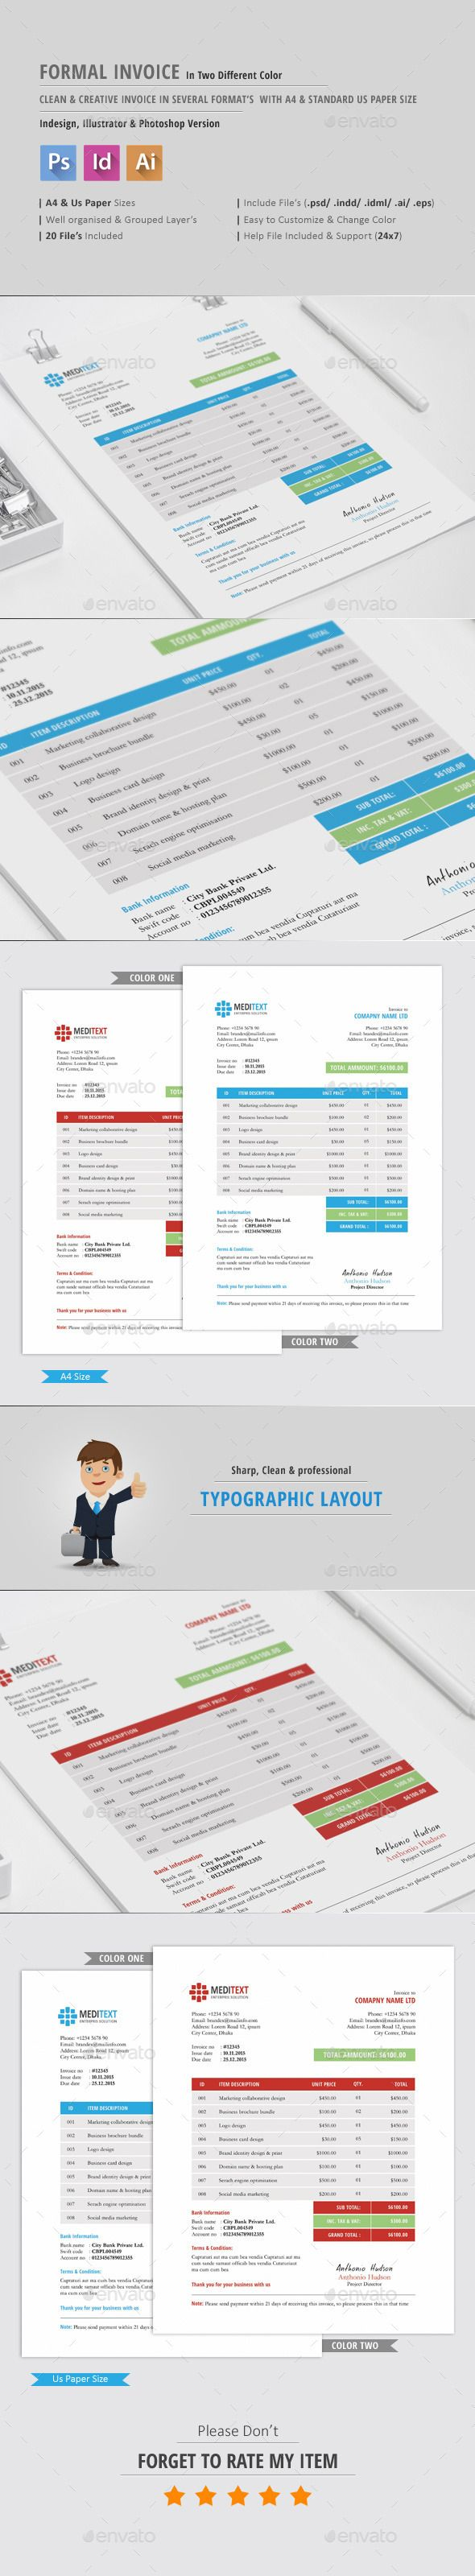 formal invoice template creative illustrators and ai illustrator formal invoice template vector eps indesign indd ai illustrator cs3 8 5